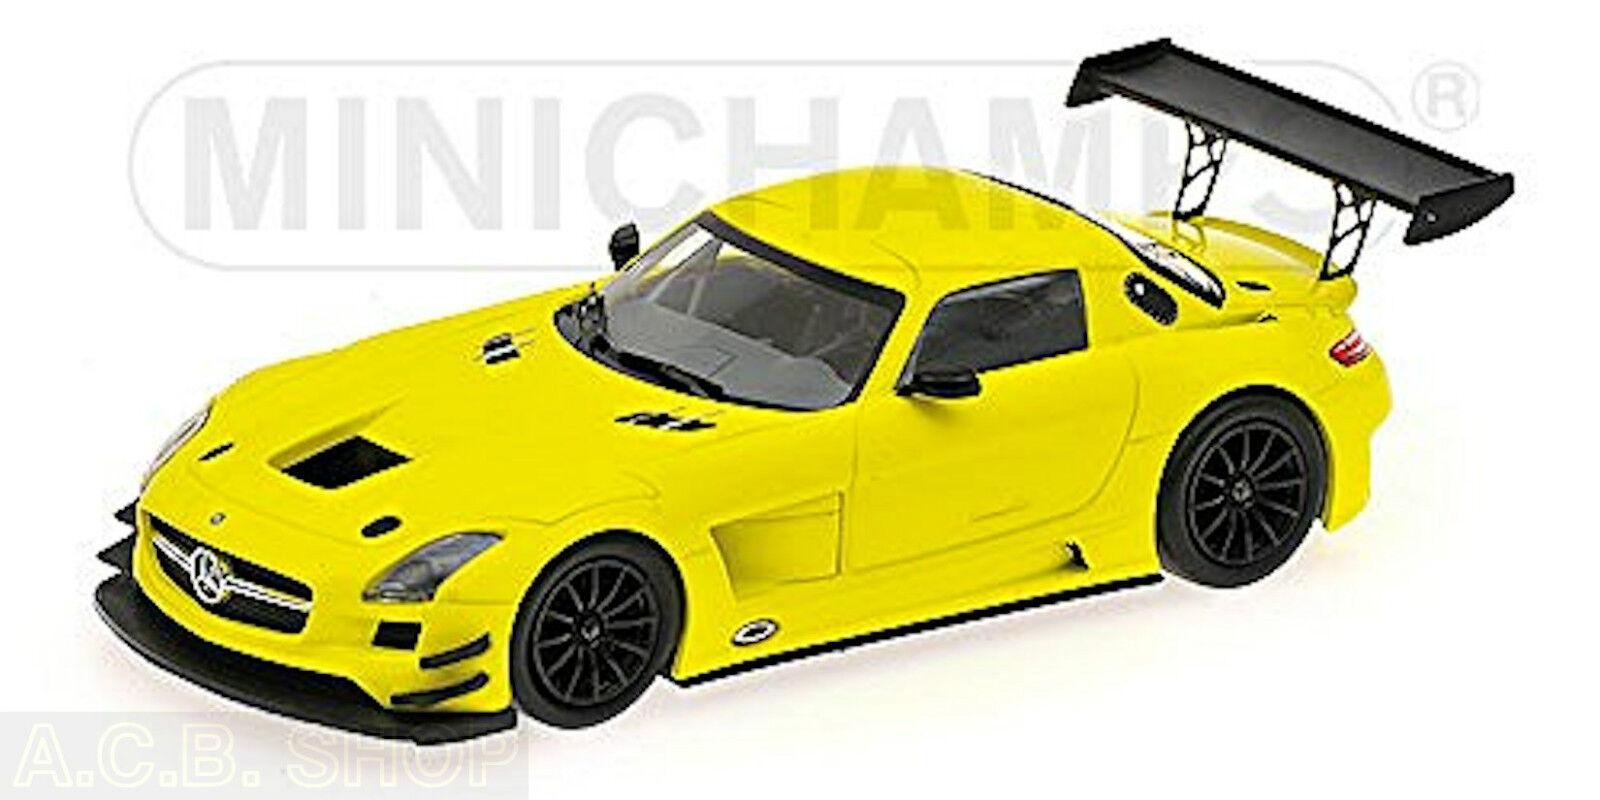 ofrecemos varias marcas famosas Mercedes Benz SLS AMG AMG AMG gt3 Street amarillo amarillo ed. 528 PCs. 1 43 Minichamps  edición limitada en caliente